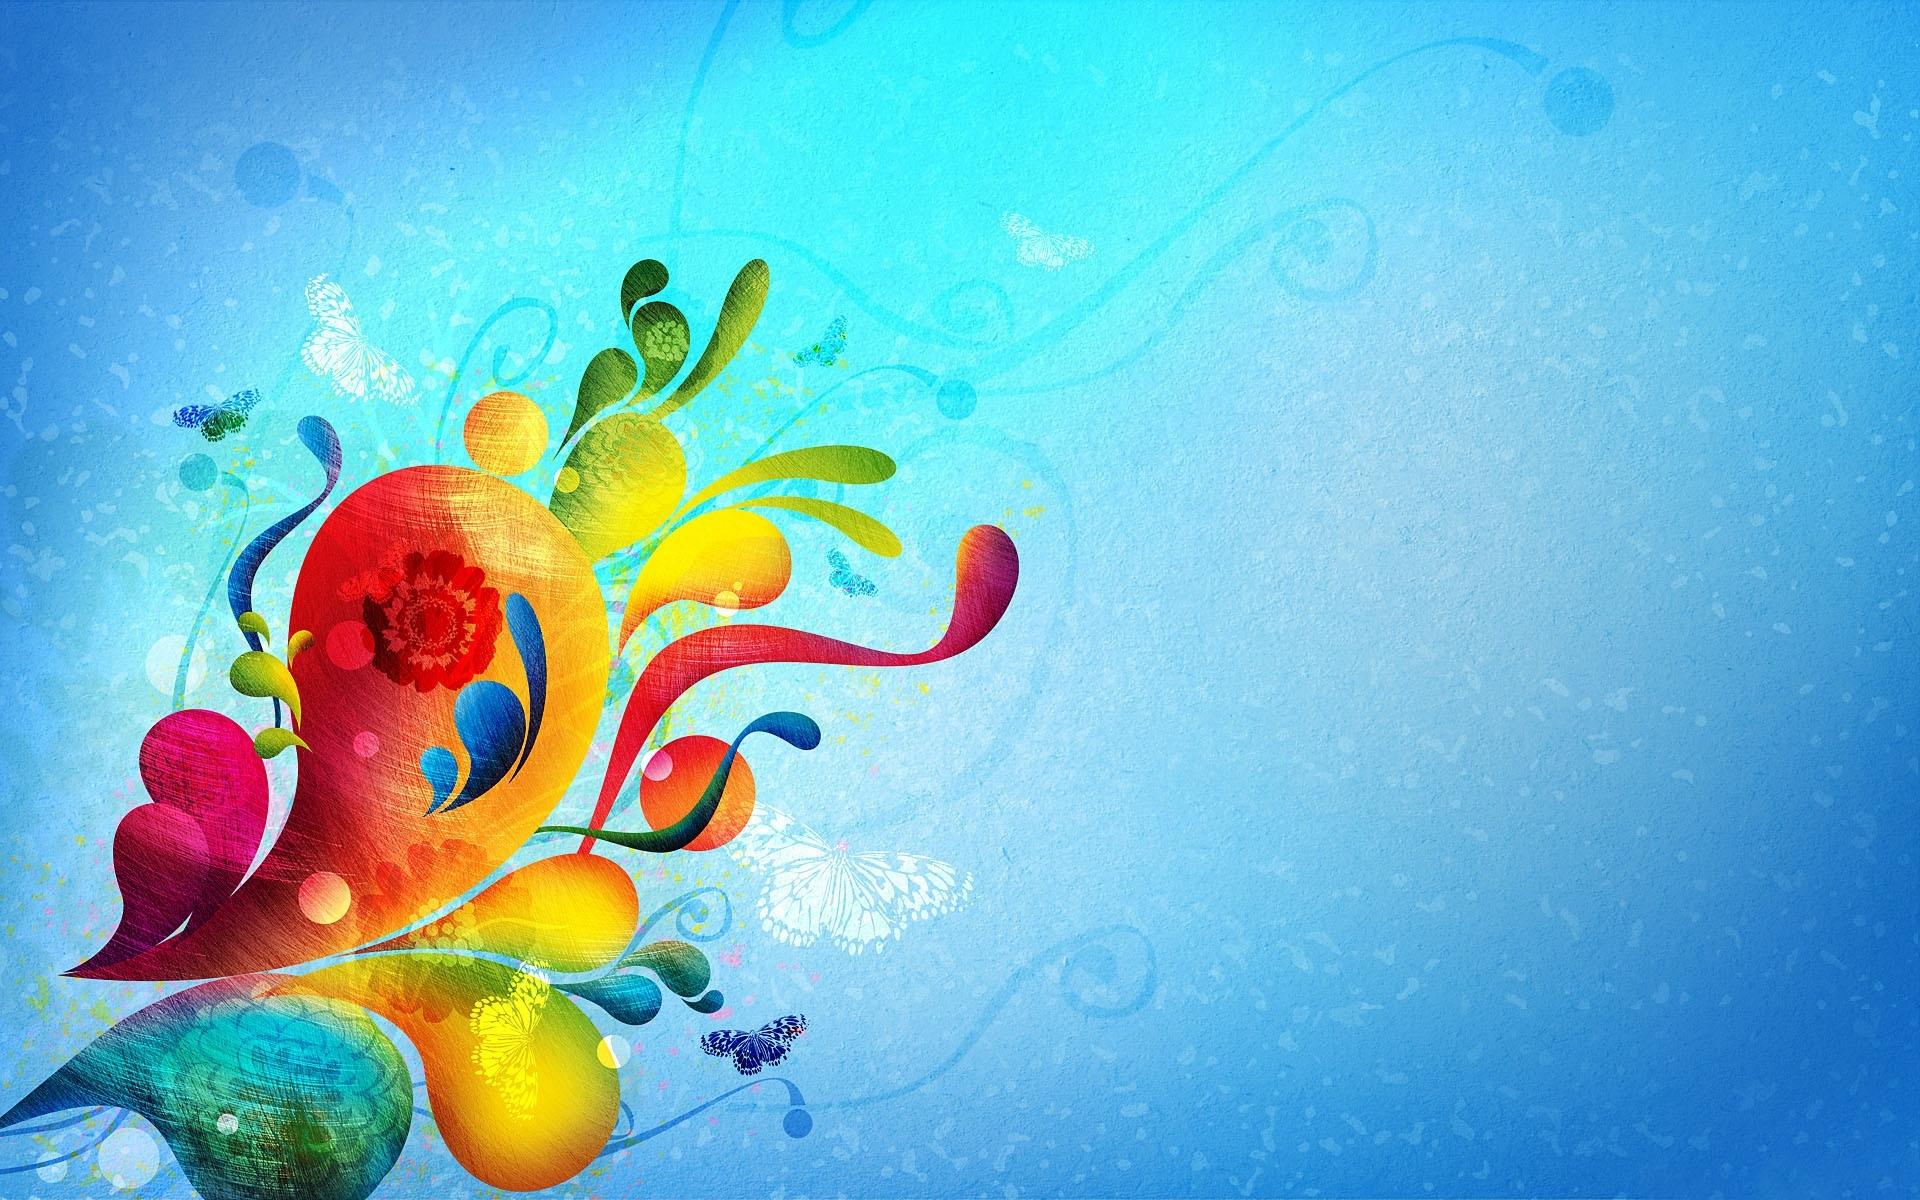 wallpaper illustration sky blue underwater vector happiness